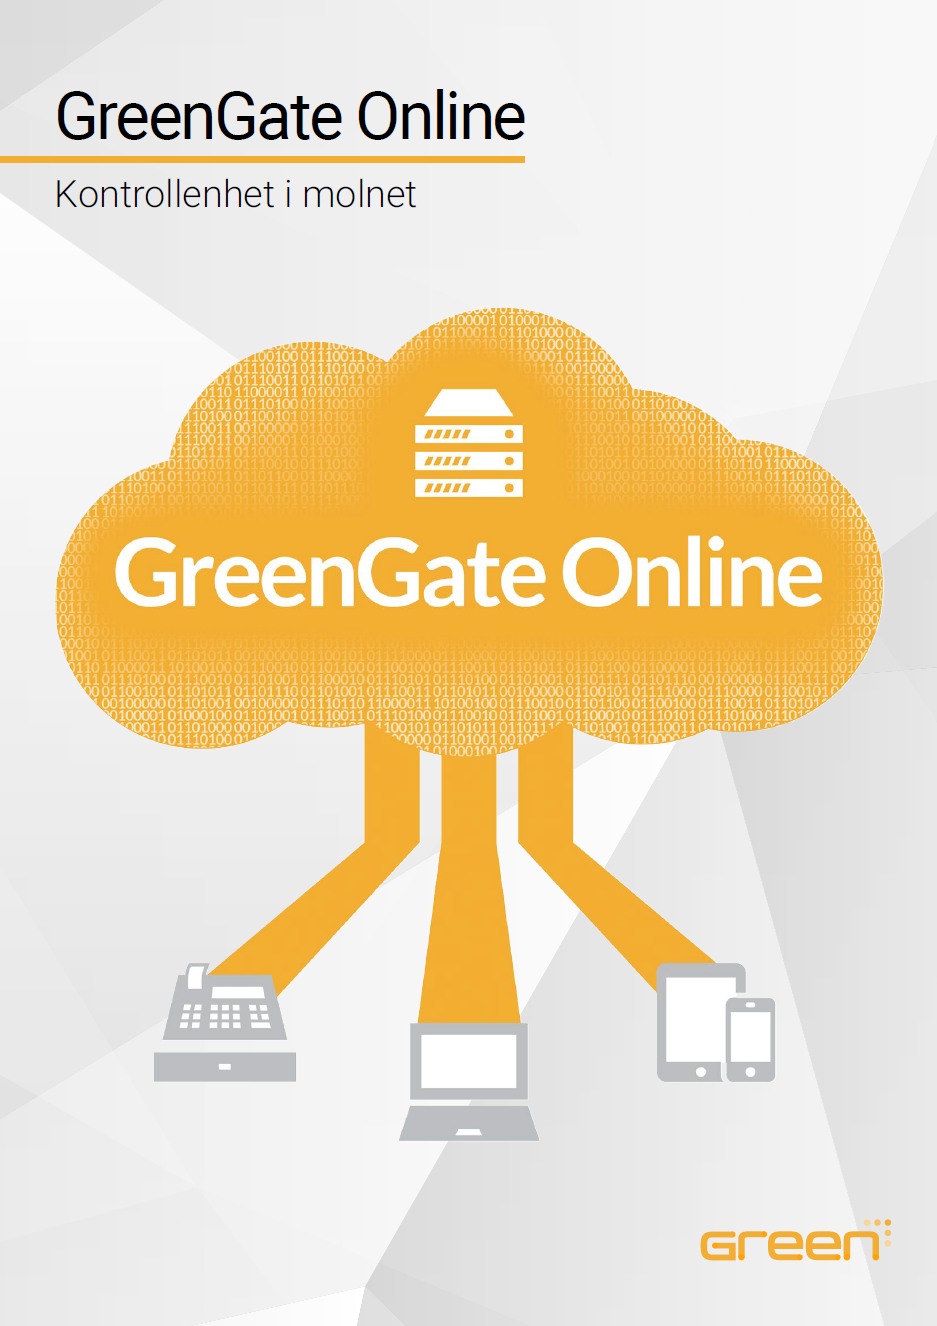 GreenGate Online - Kontrollenhet i molnet